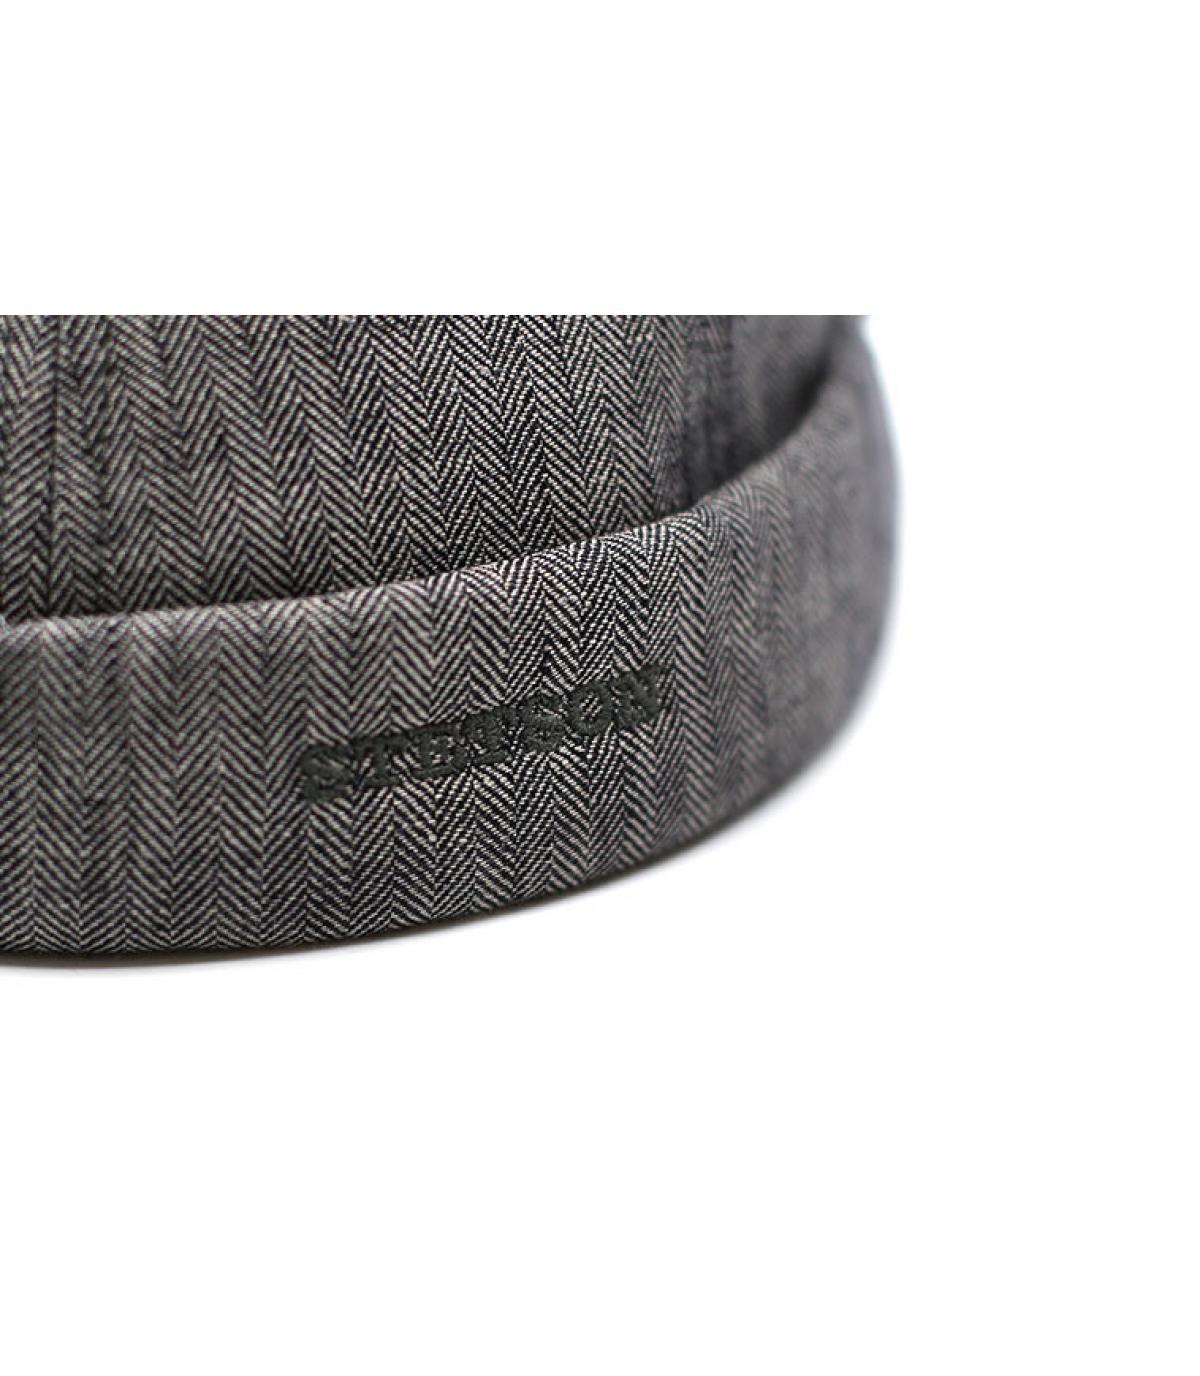 Détails Docker lin grey - image 3